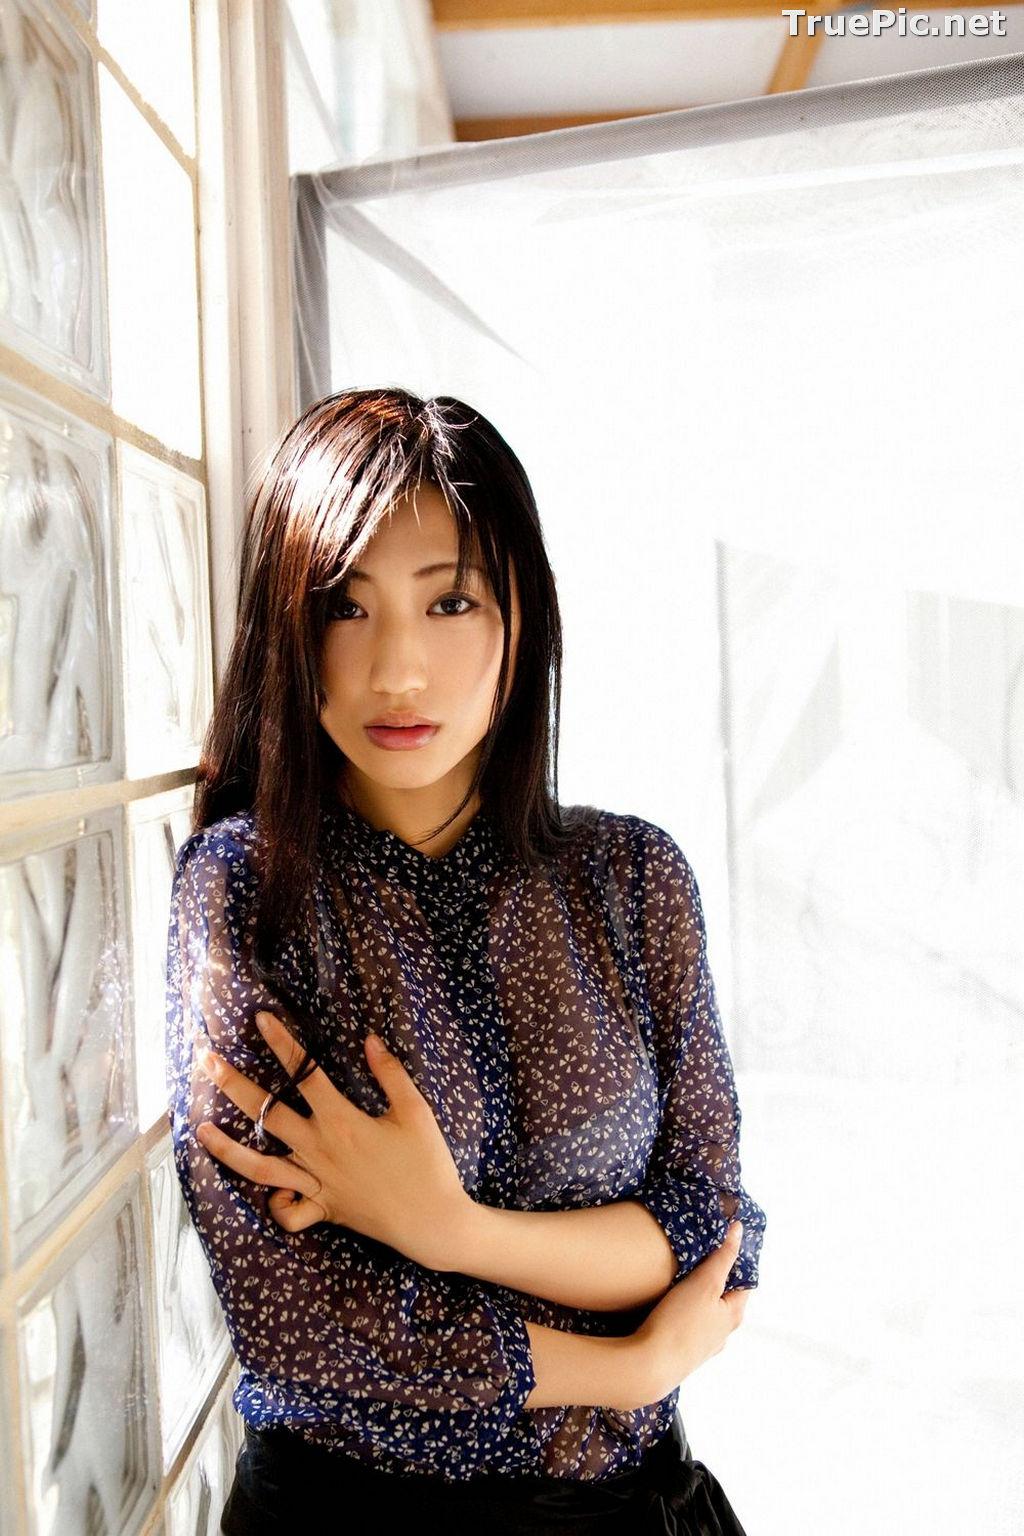 Image [YS Web] Vol.525 - Japanese Actress and Gravure Idol - Mitsu Dan - TruePic.net - Picture-1